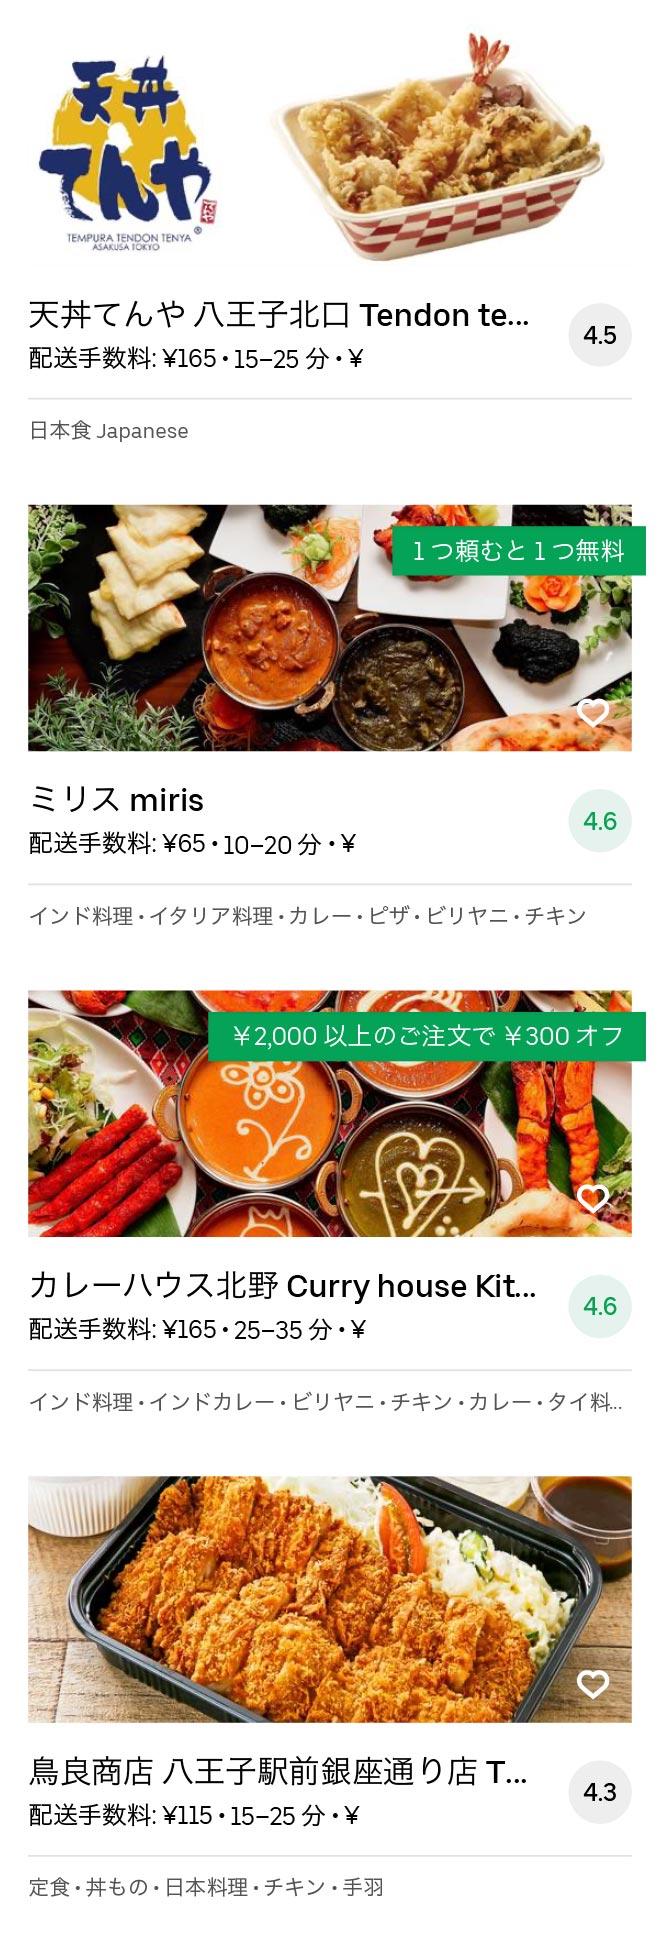 Hatioji menu 2010 07